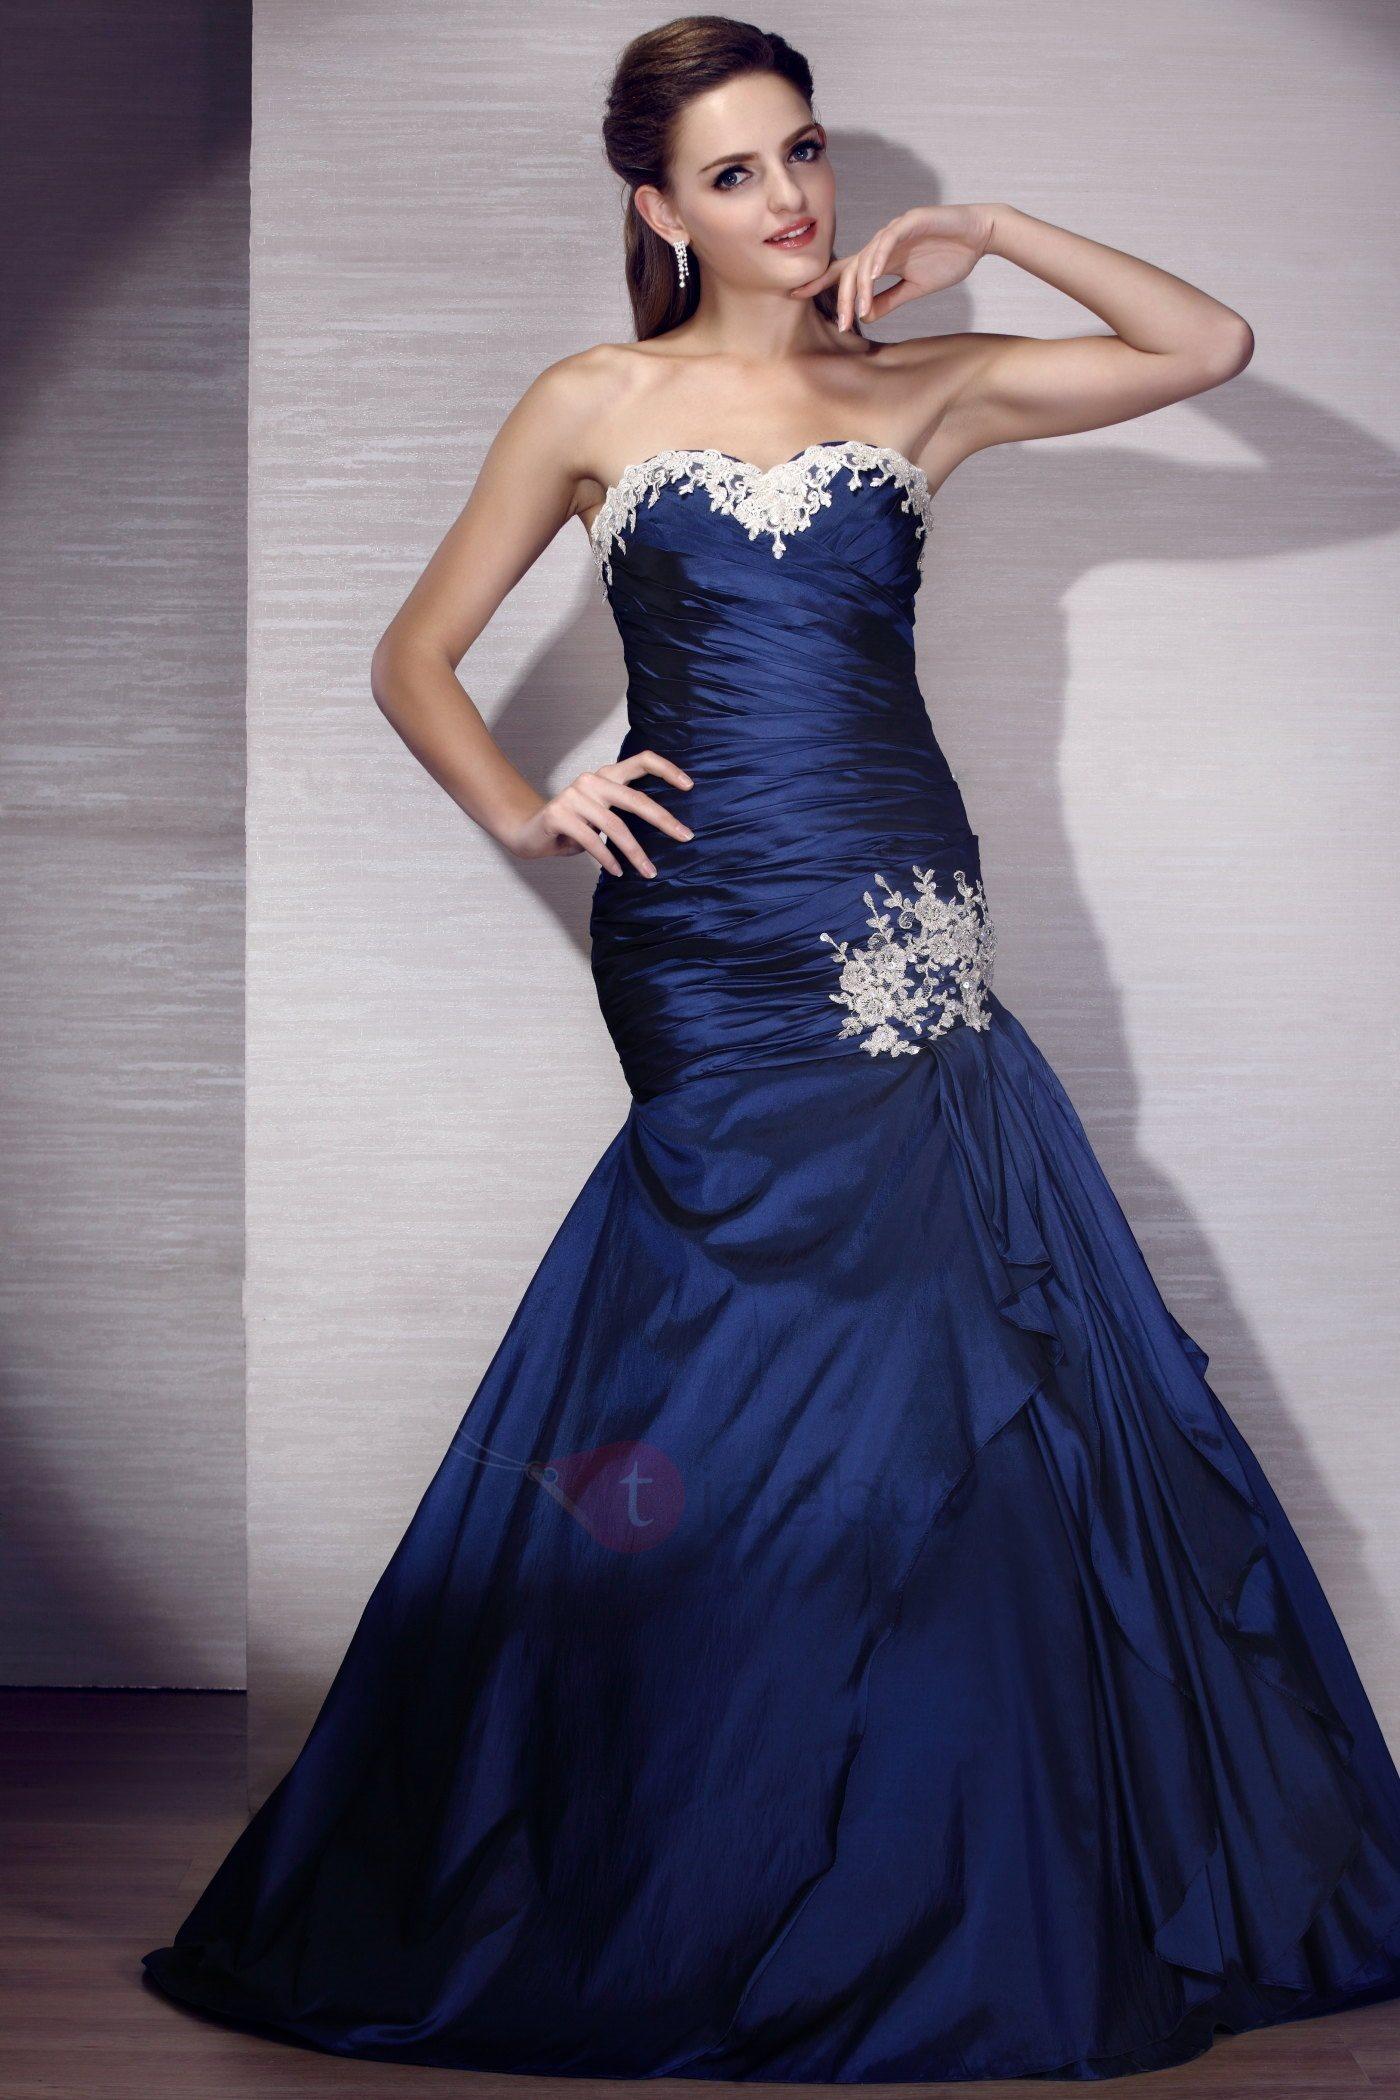 prom evening dress photo - 1